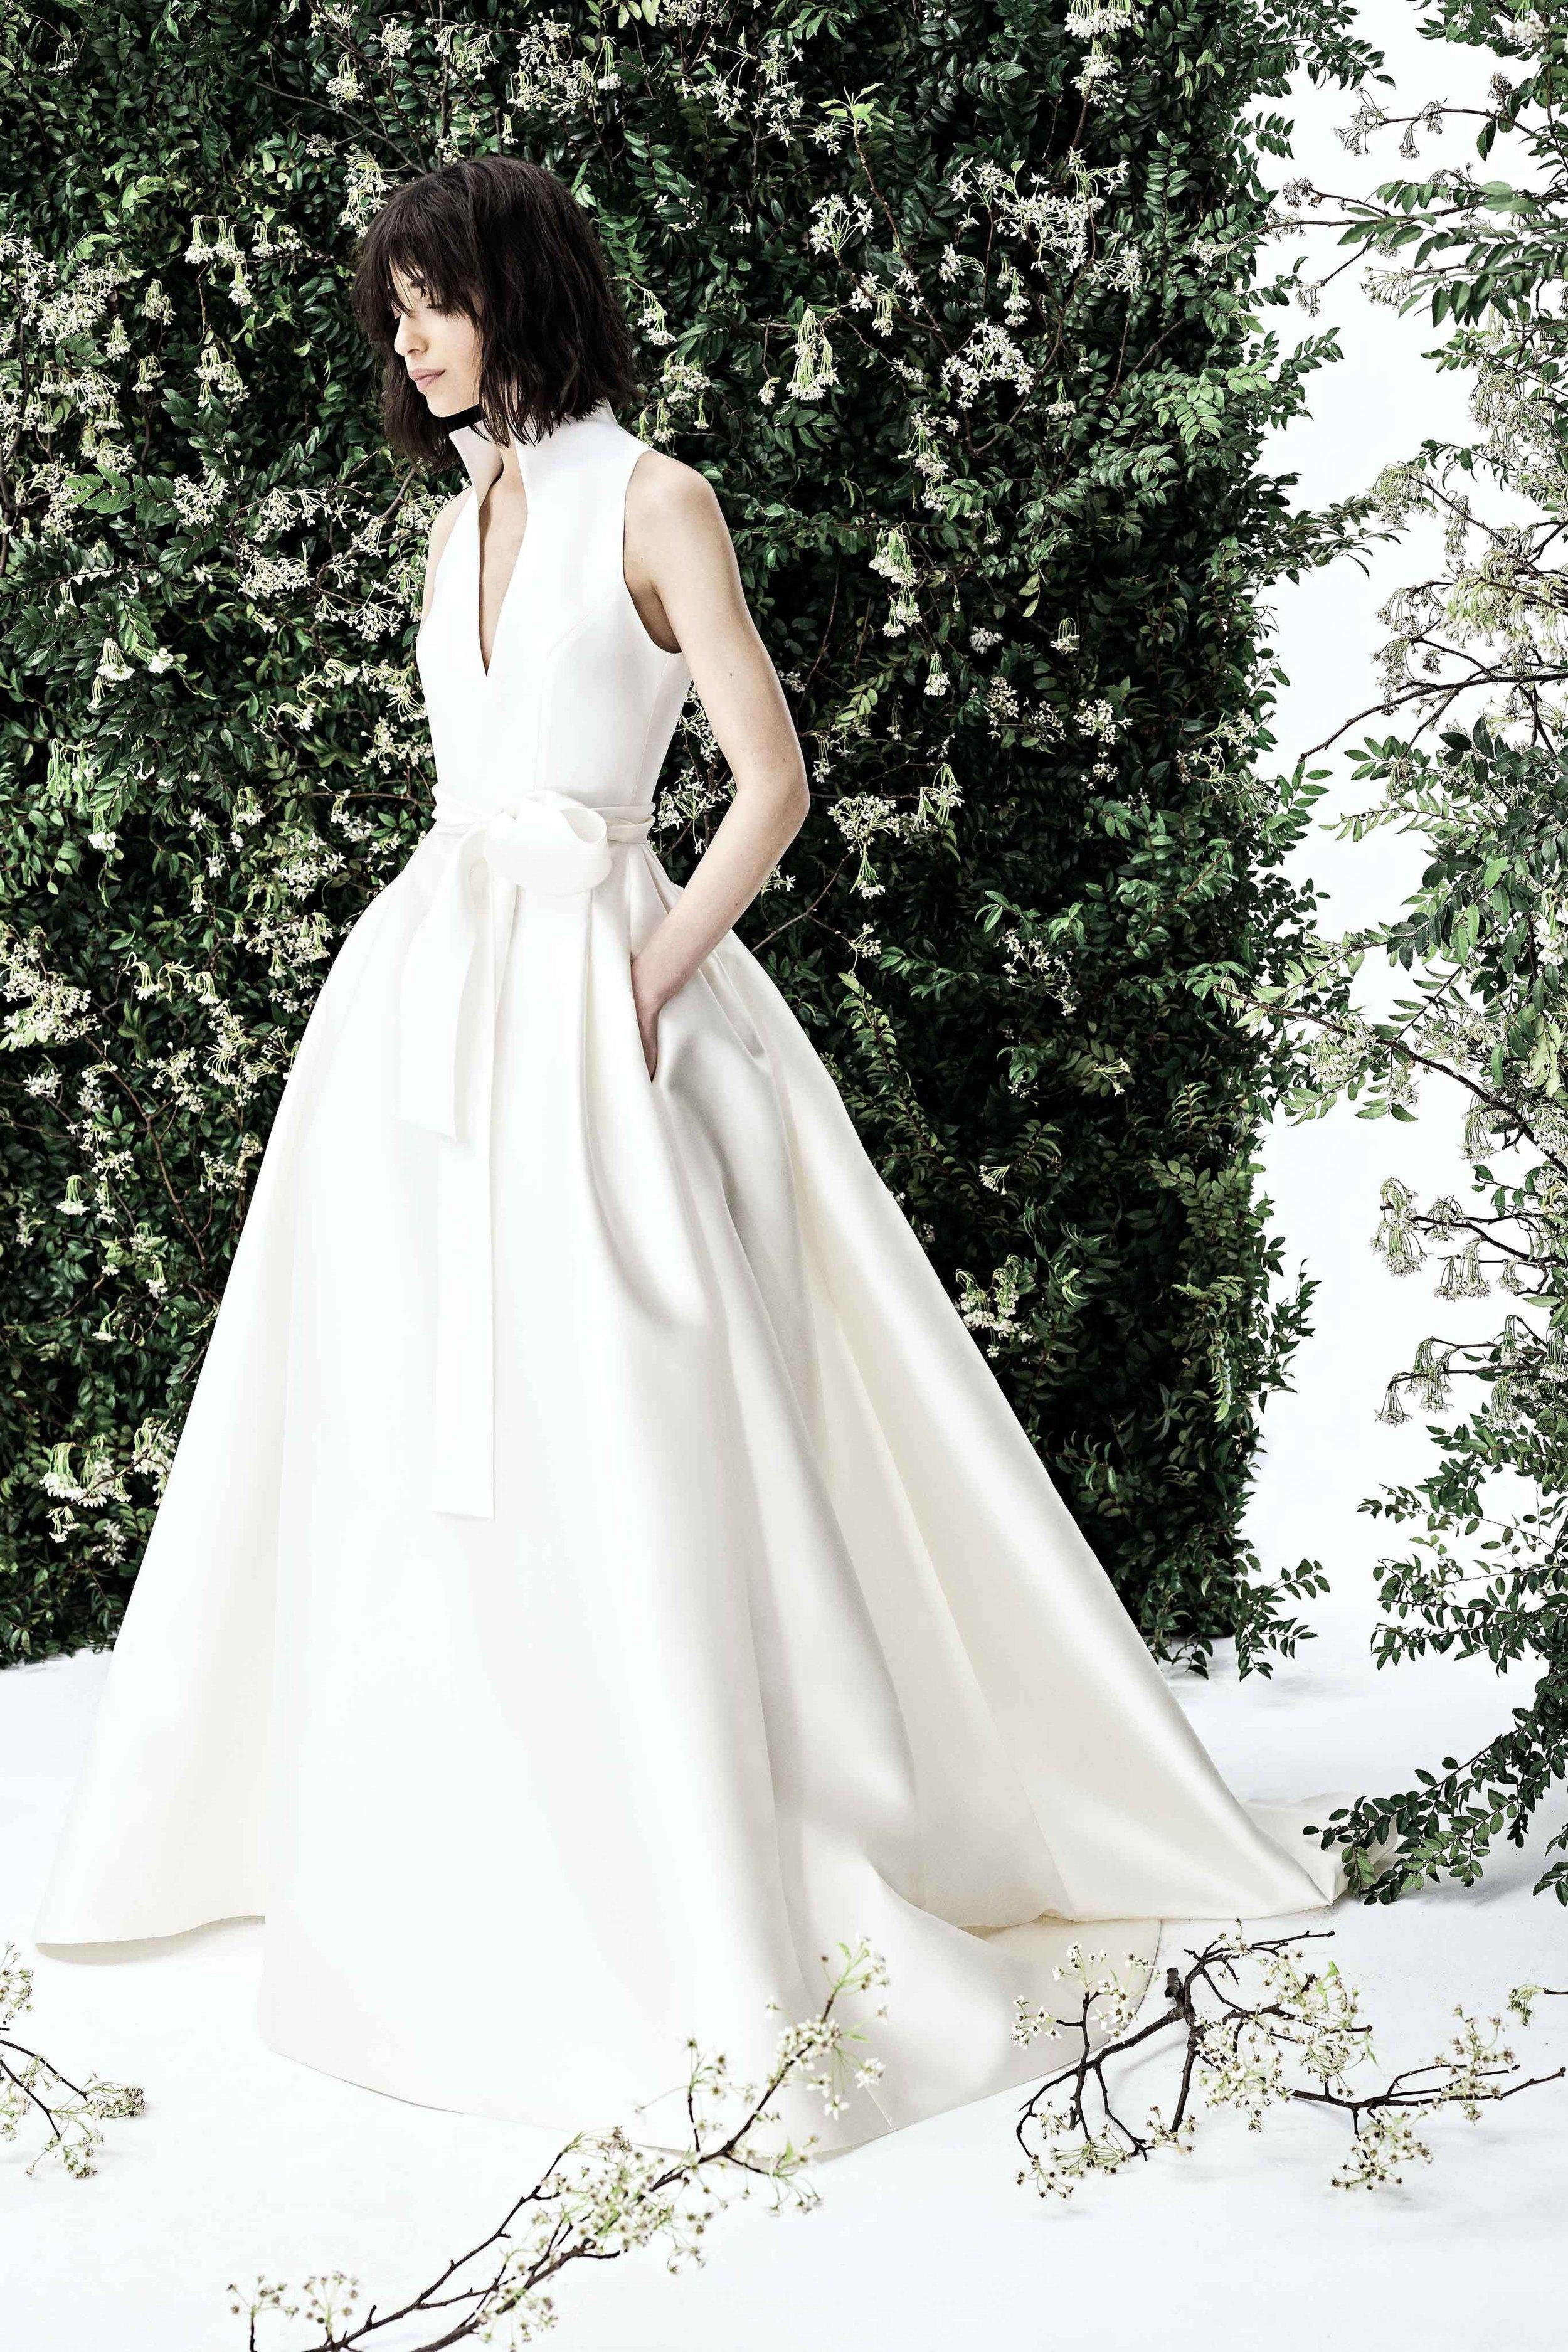 00014-Carolina-Herrera-New-York-Bridal-Spring-2020-credit-Courtesy-of-Carolina-Herrera.jpg